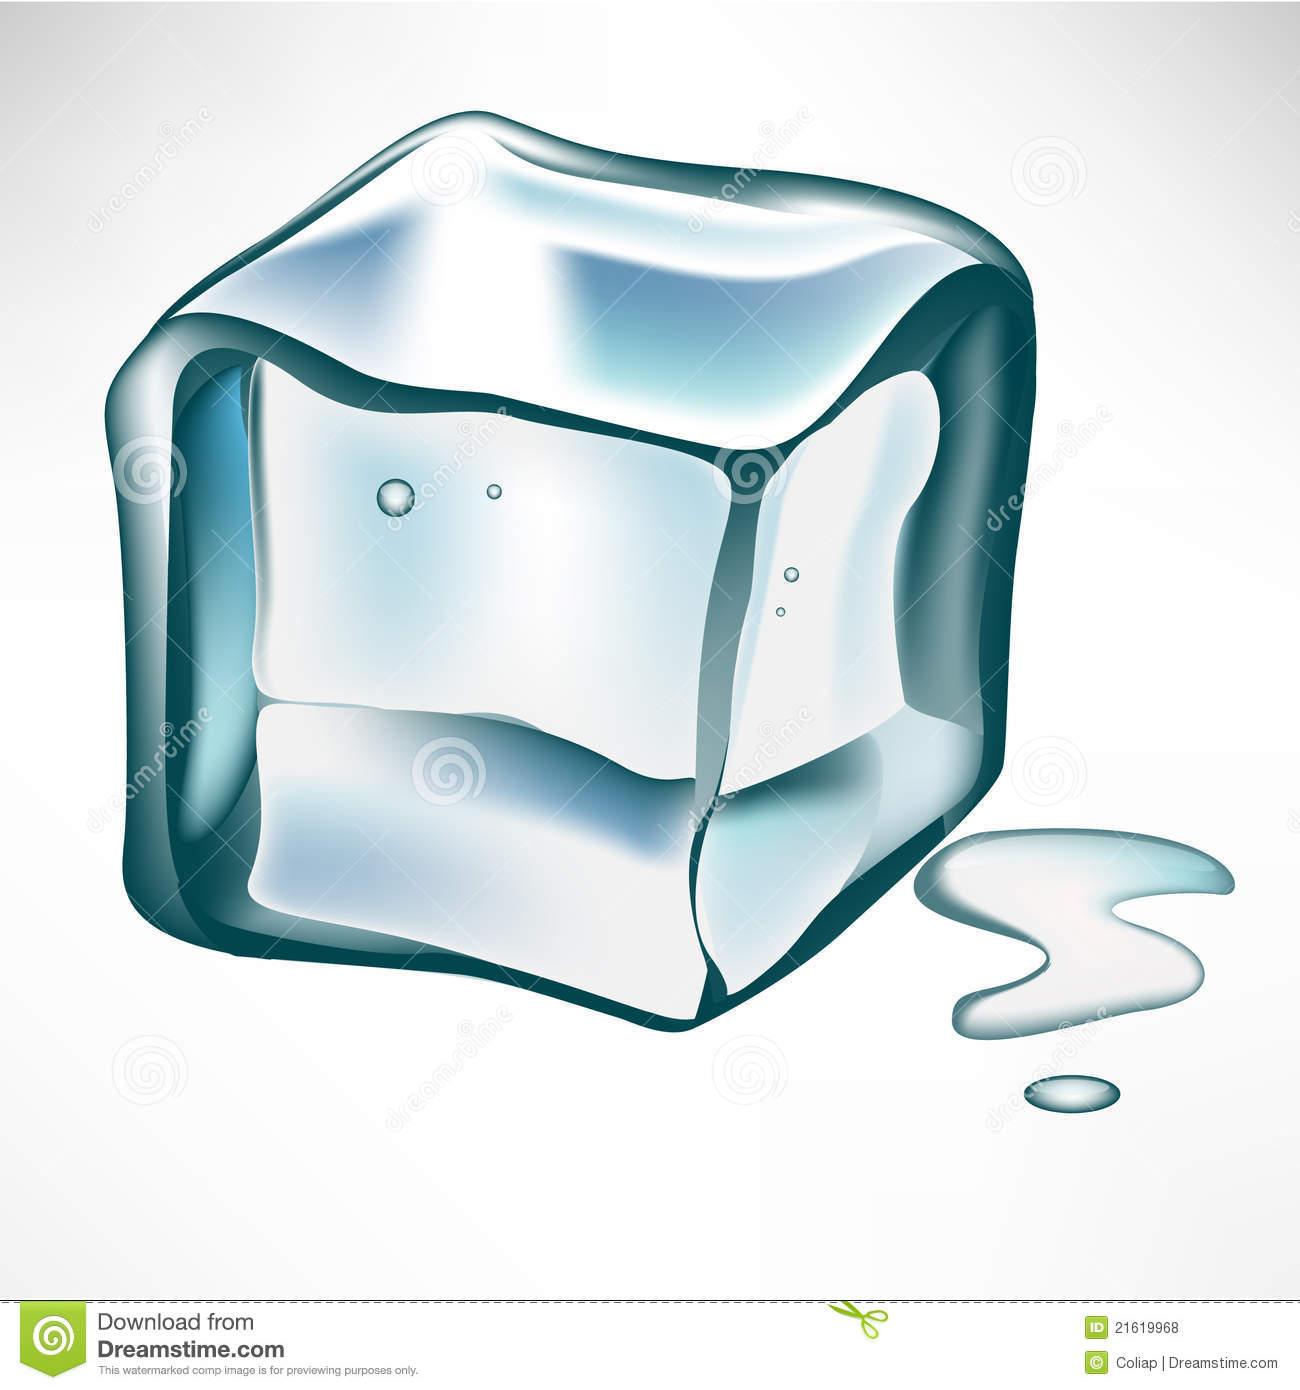 Ice Cube Clipart Single Ice Cube-Ice Cube Clipart Single Ice Cube-12